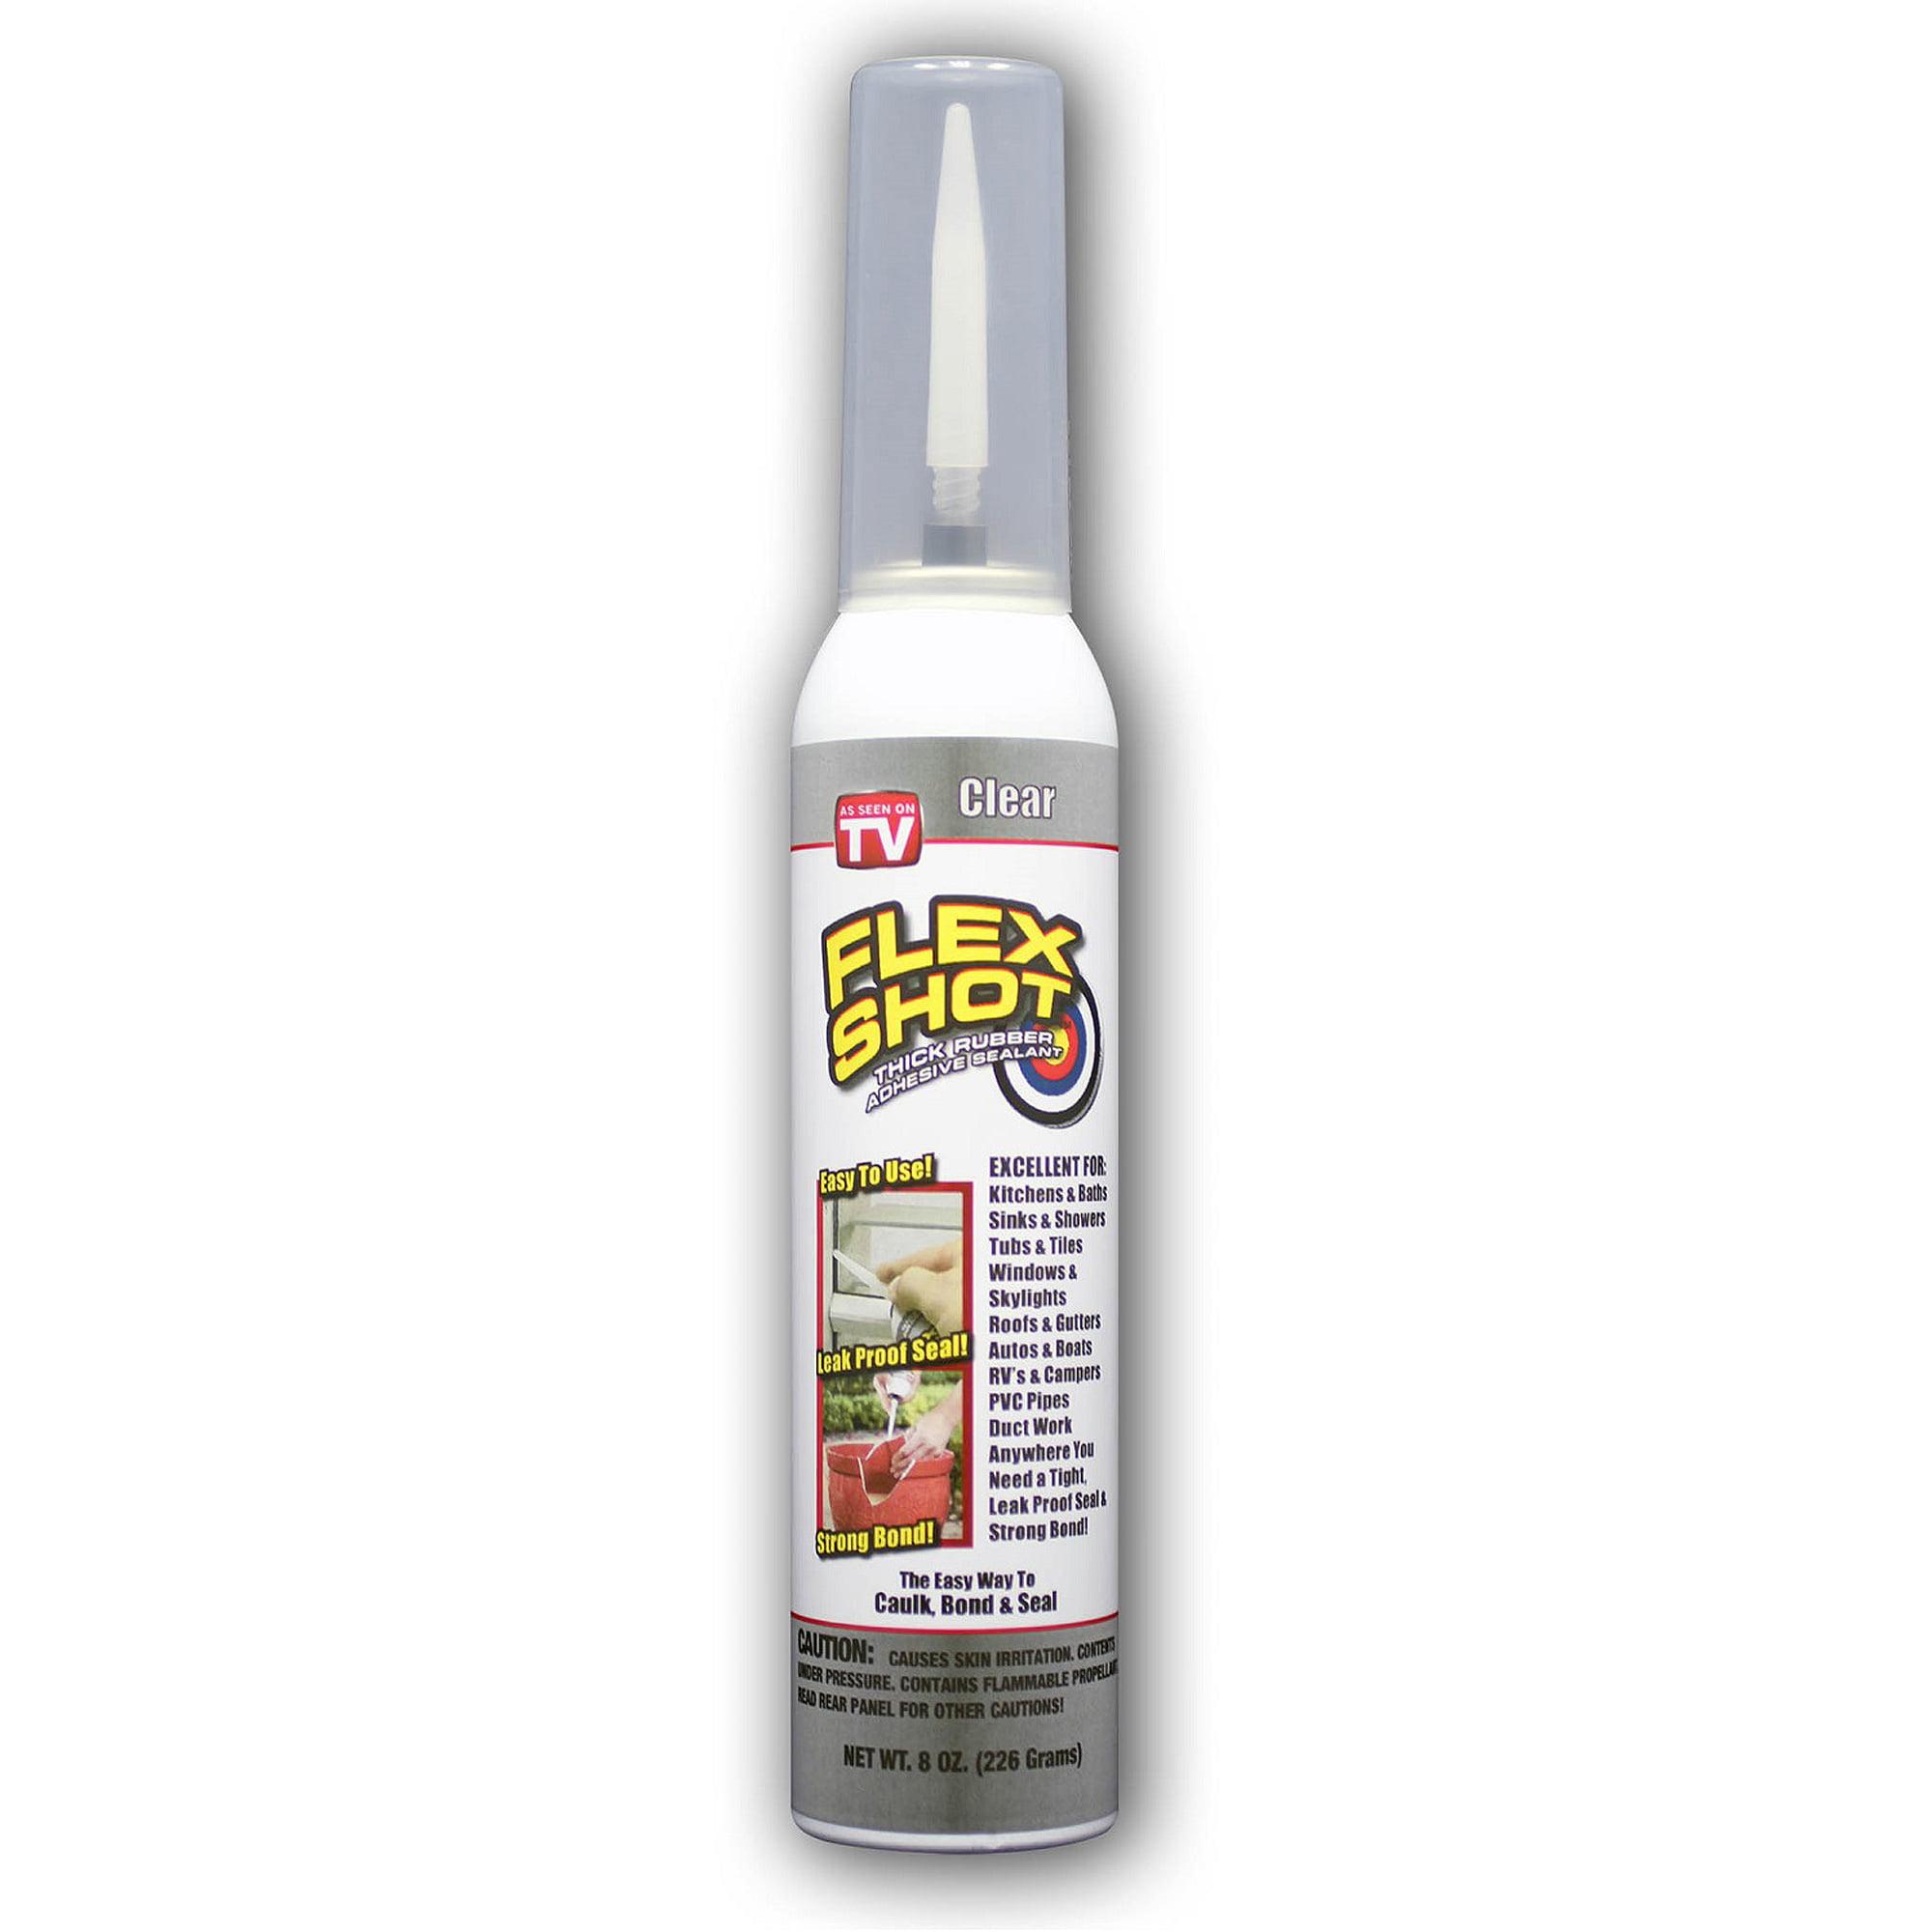 Flex Shot Thick Rubber Caulking Adhesive Waterproof Sealant, Caulks Bonds  And Seals! Clear 8 Oz.   Walmart.com